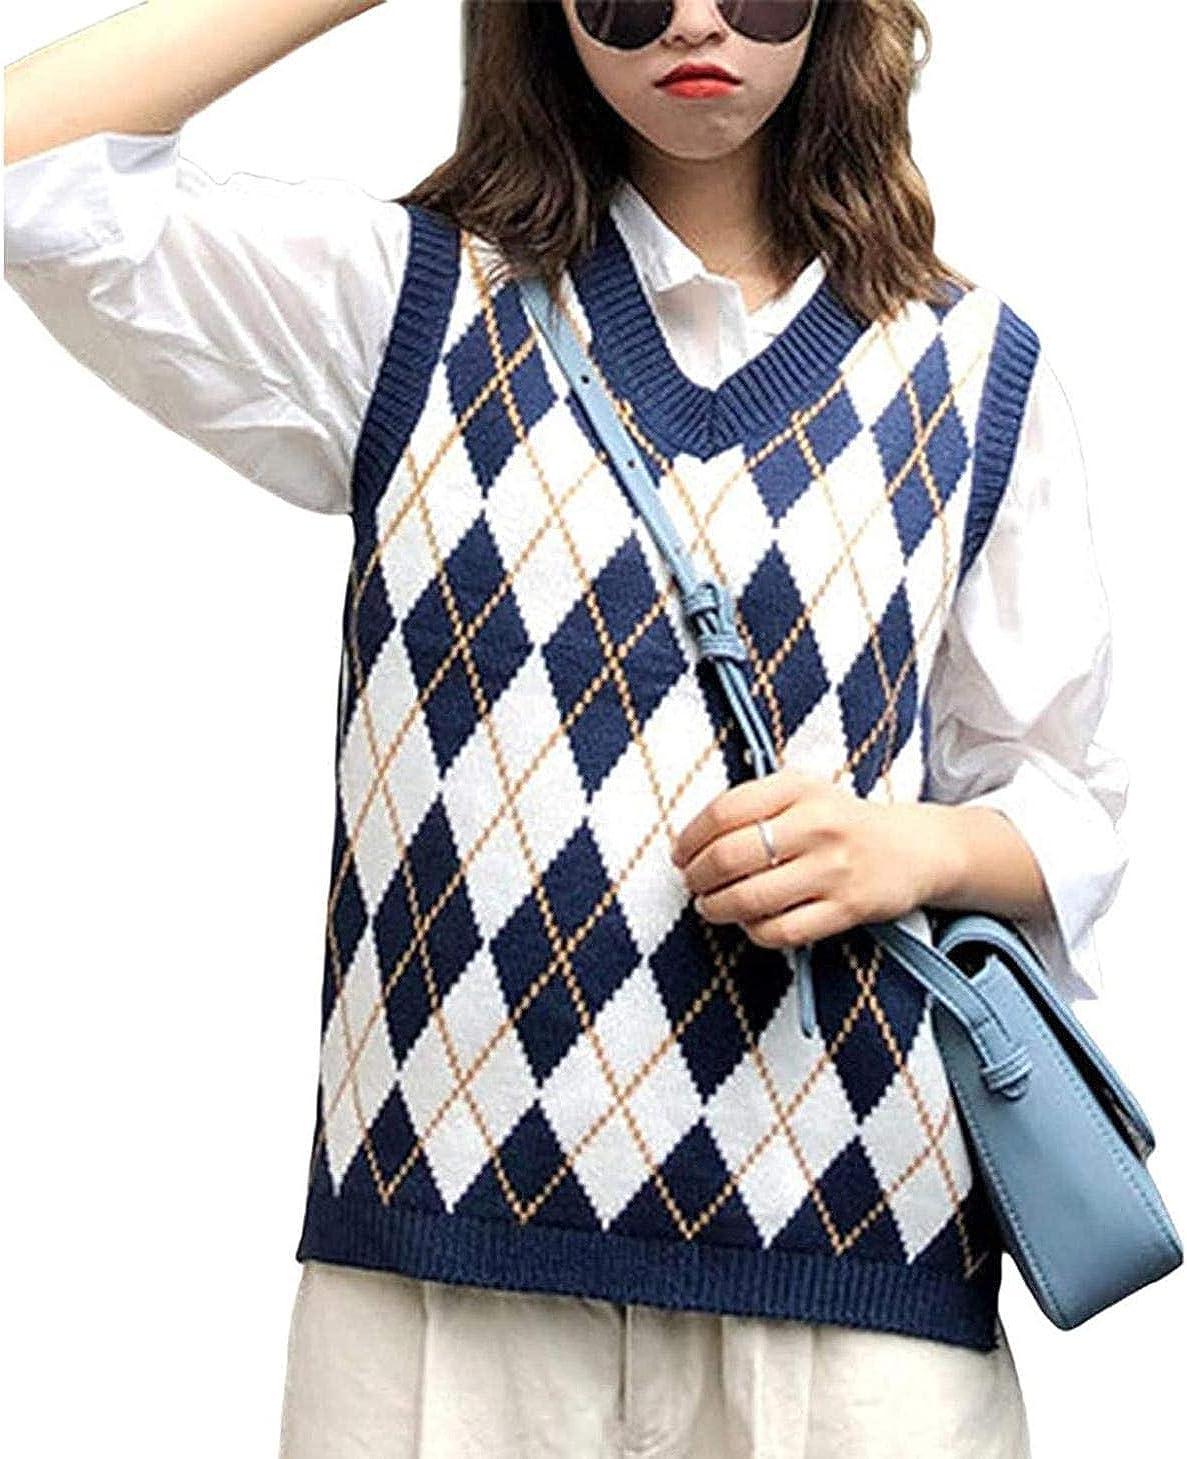 Womens Casual Plaid Knitted Tank Top Knitwear Preppy Style V-Neck Vest Sweater Vintage Streetwear Crop